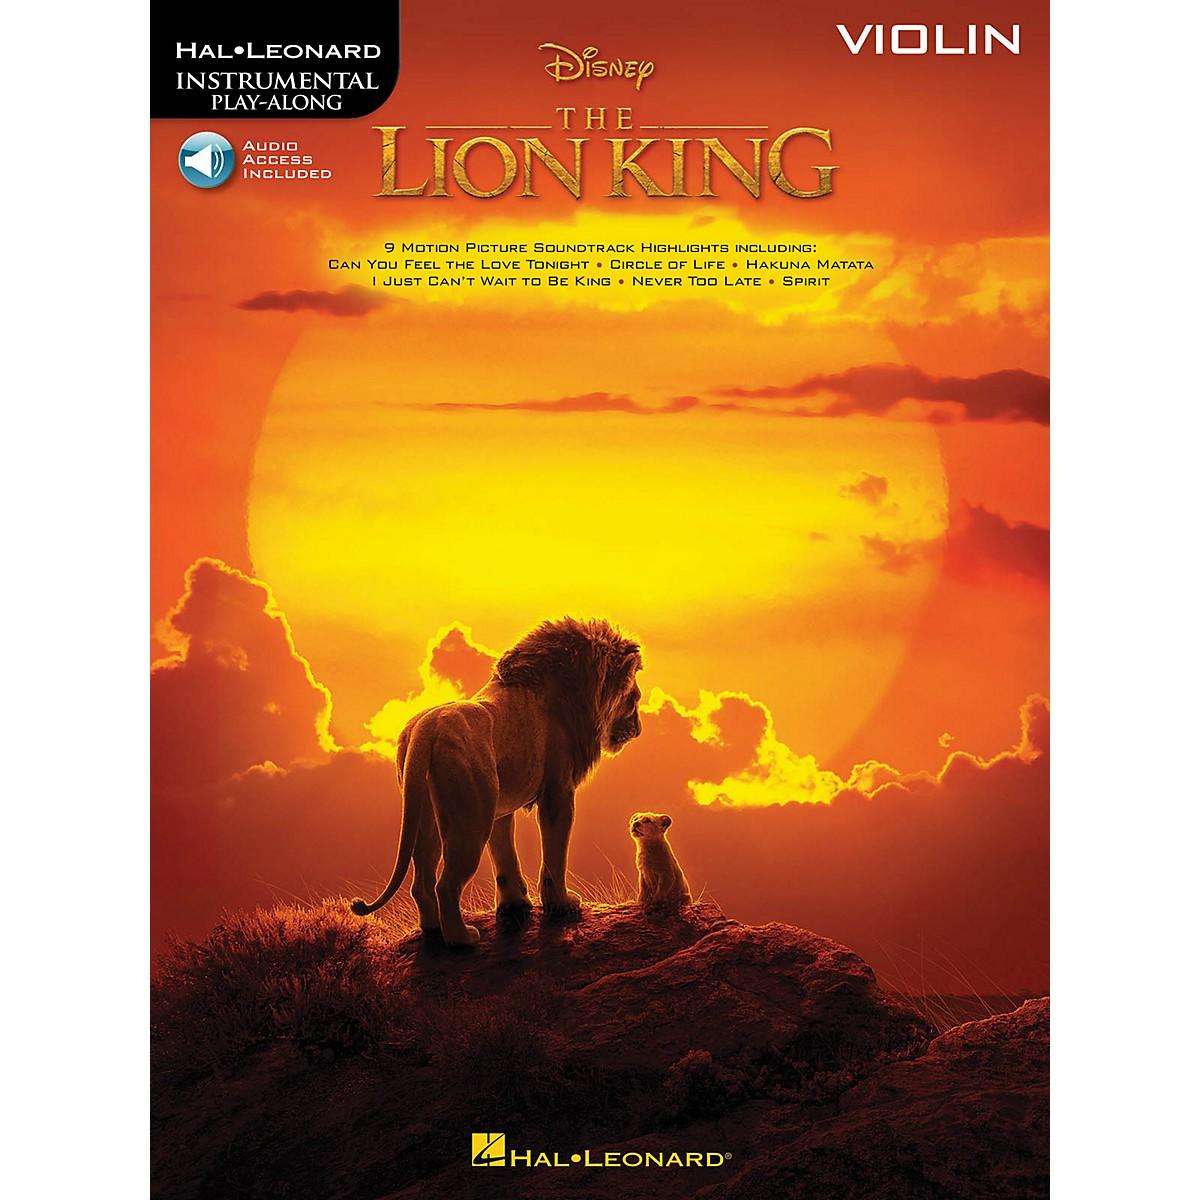 Hal Leonard The Lion King for Violin Instrumental Play-Along Book/Audio Online